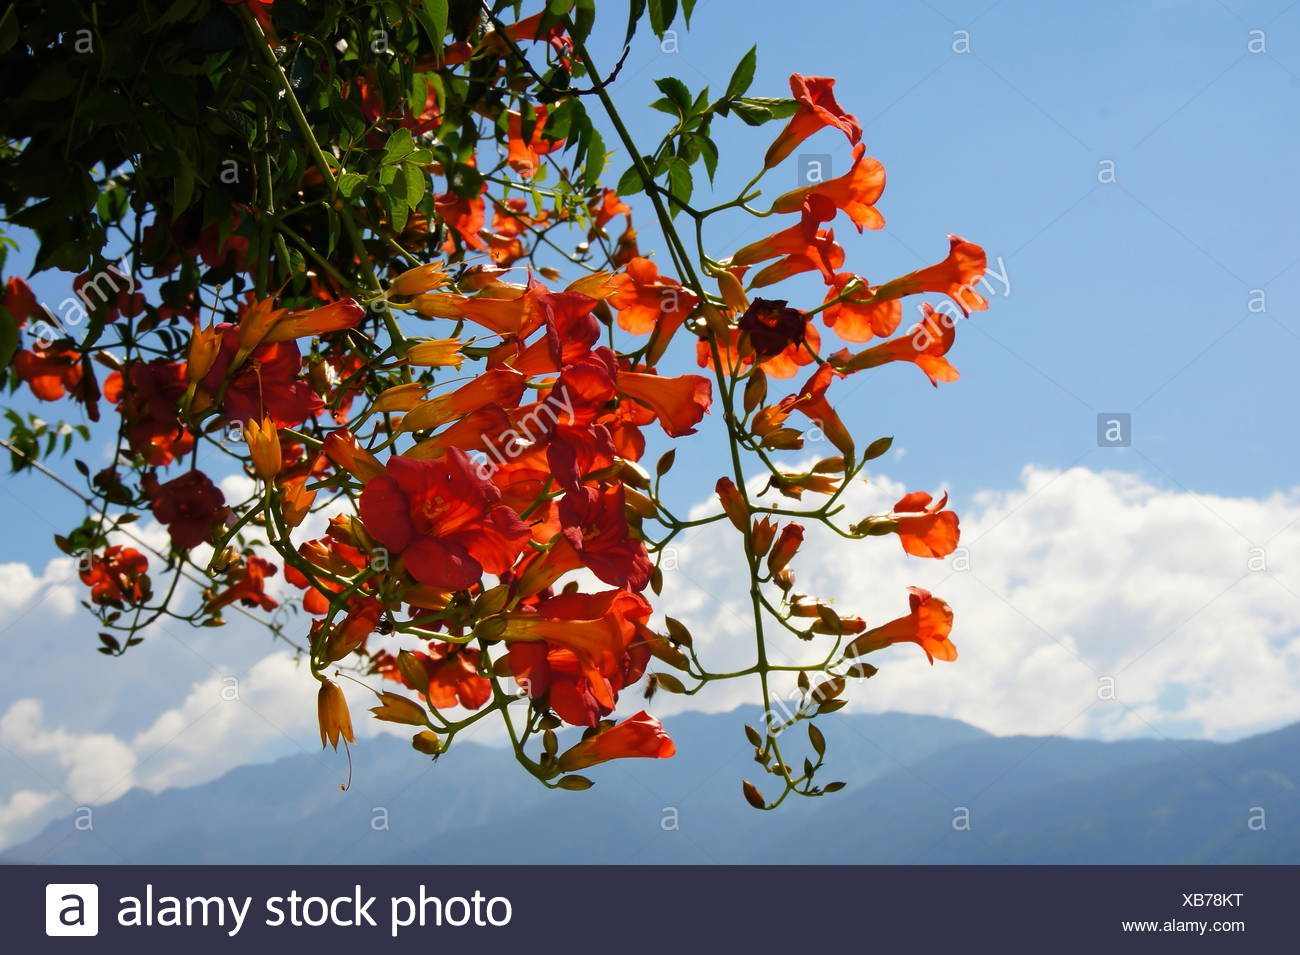 ruddiness, red, flower, plant, bloom, blossom, flourish, flourishing, cirrus, Stock Photo